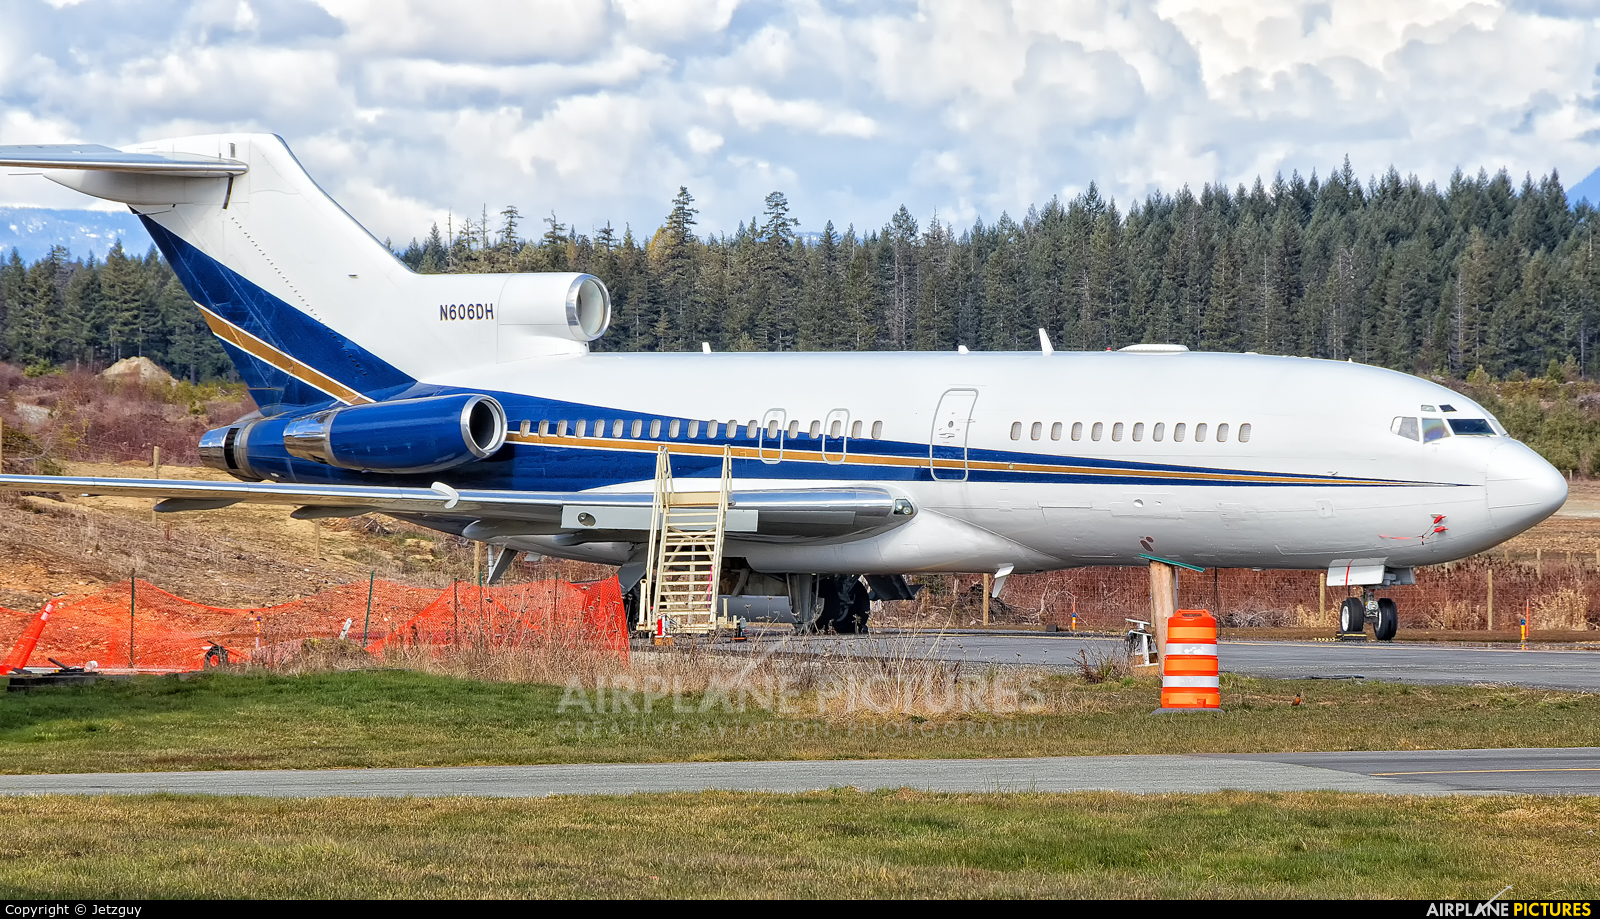 Private N606DH aircraft at Port Alberni, BC